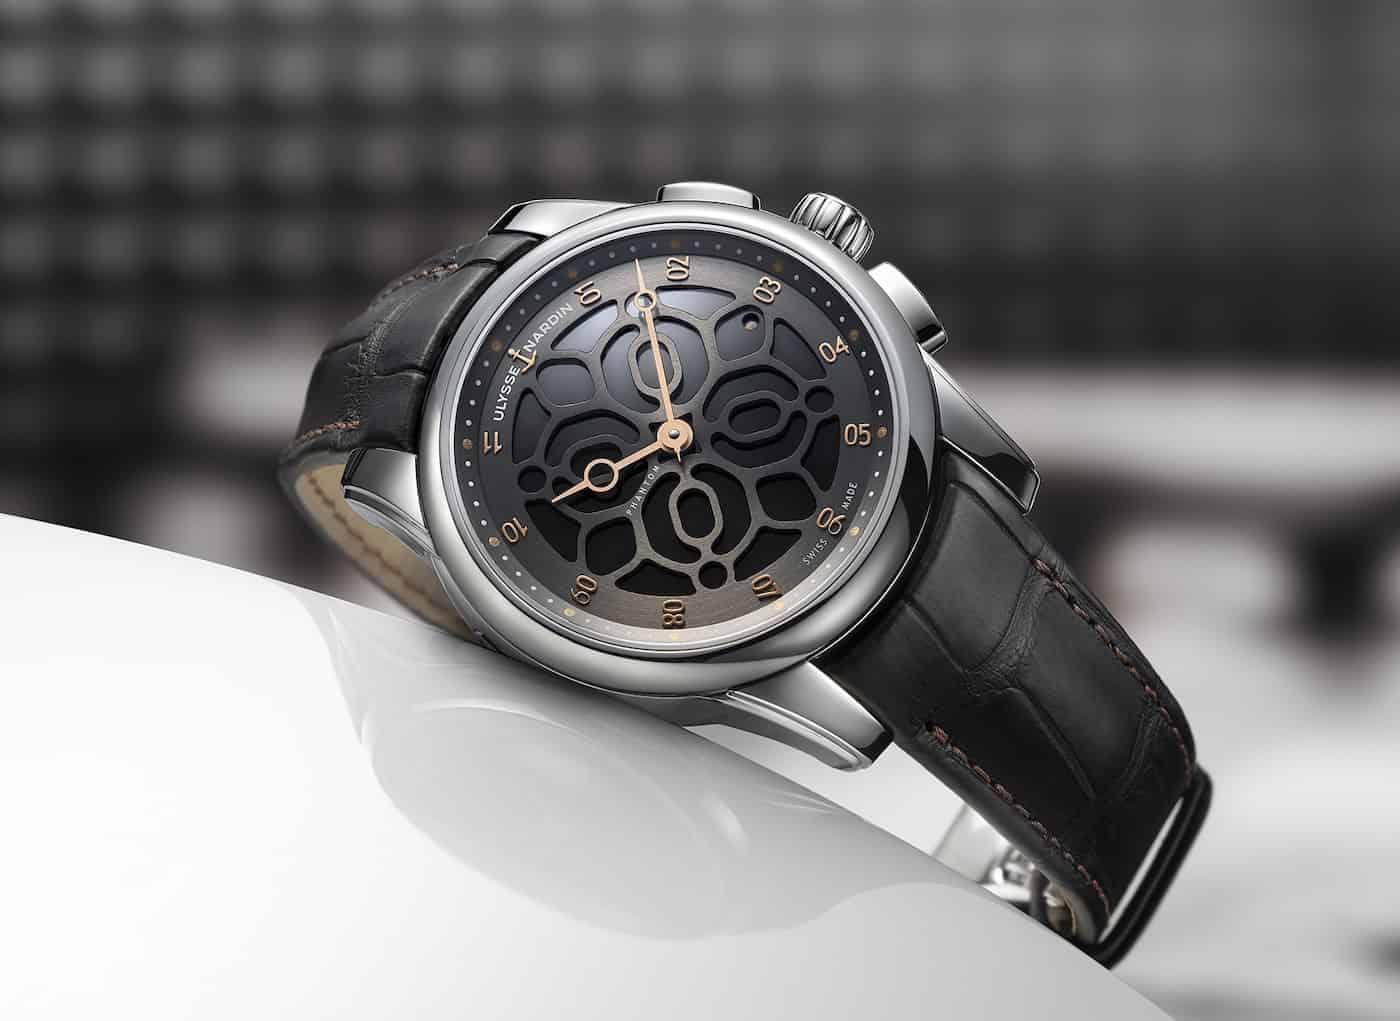 Ulysse Nardin and Devialet Unite to Create the Limited Edition Ulysse Nardin Hourstriker Phantom